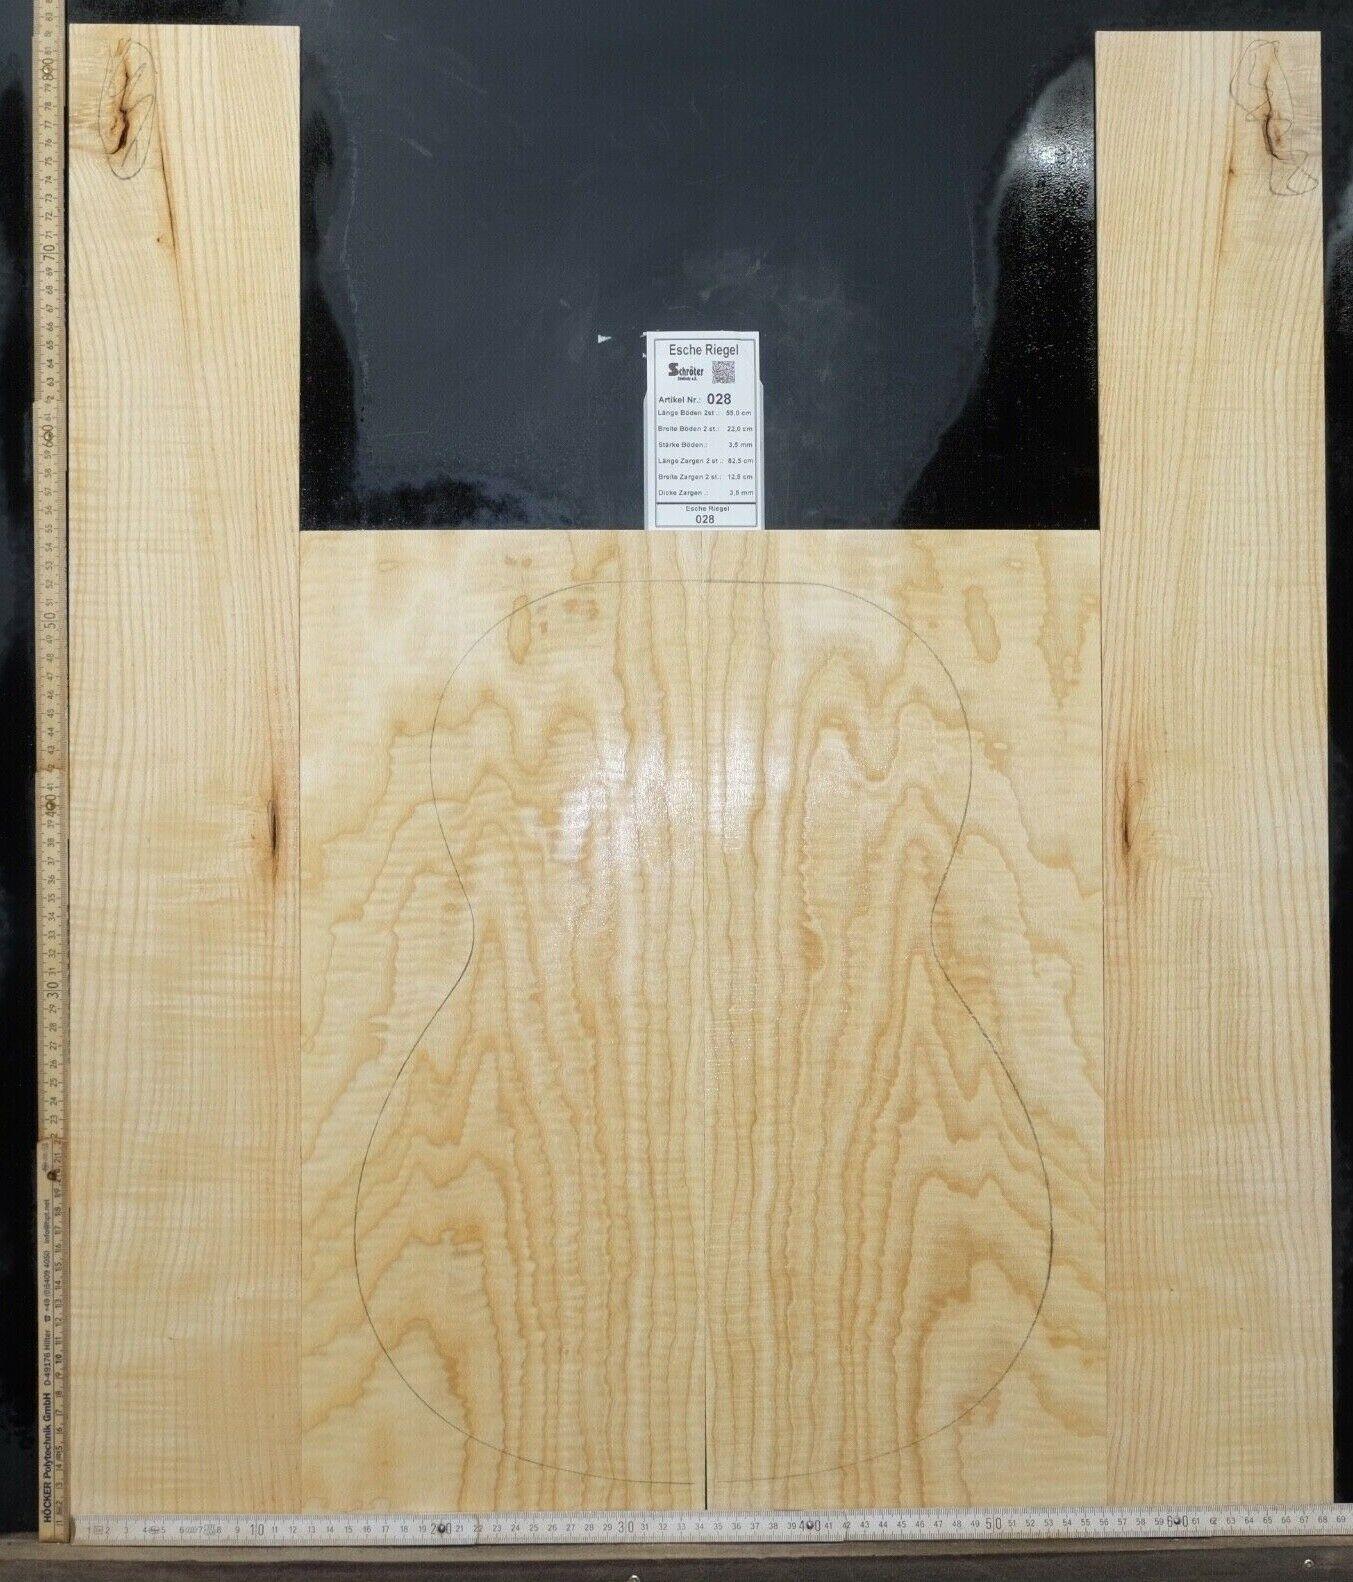 Tonewood Esche Ash Tonholz Guitar Builder Luthier Acoustic Backs Side Curly 028